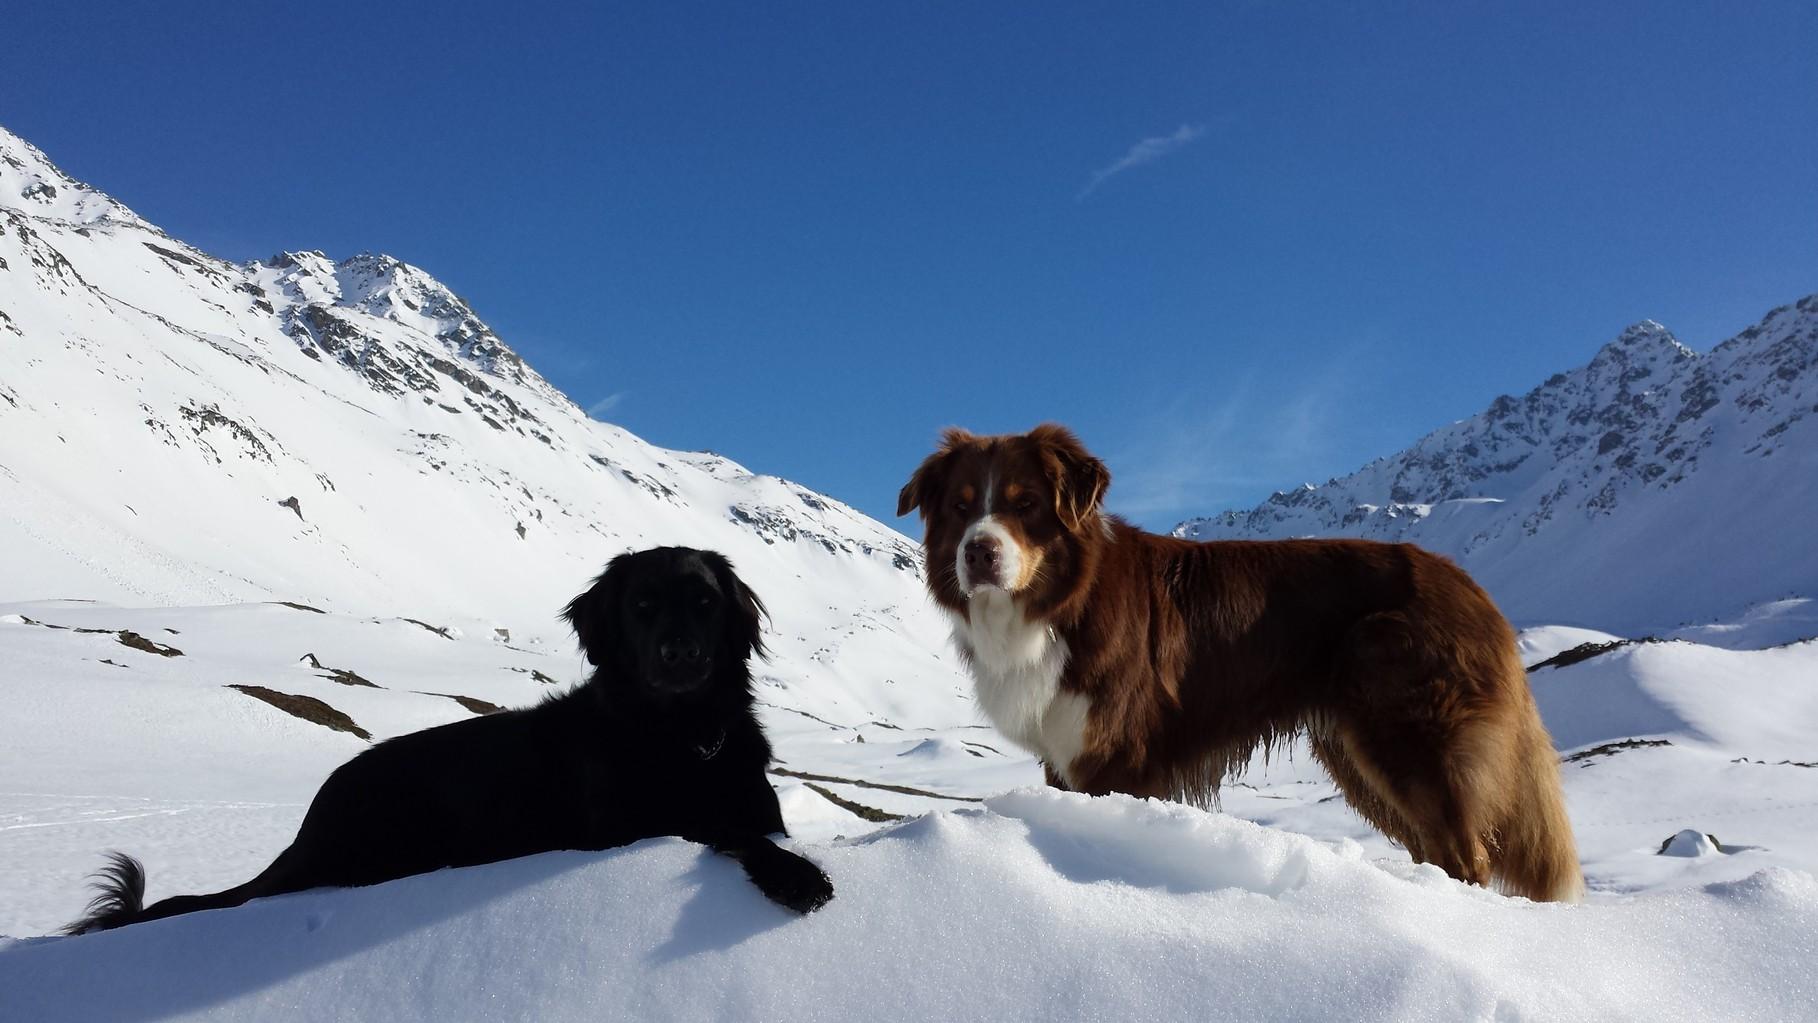 Schad de Winter isch scho fascht verbi :-((